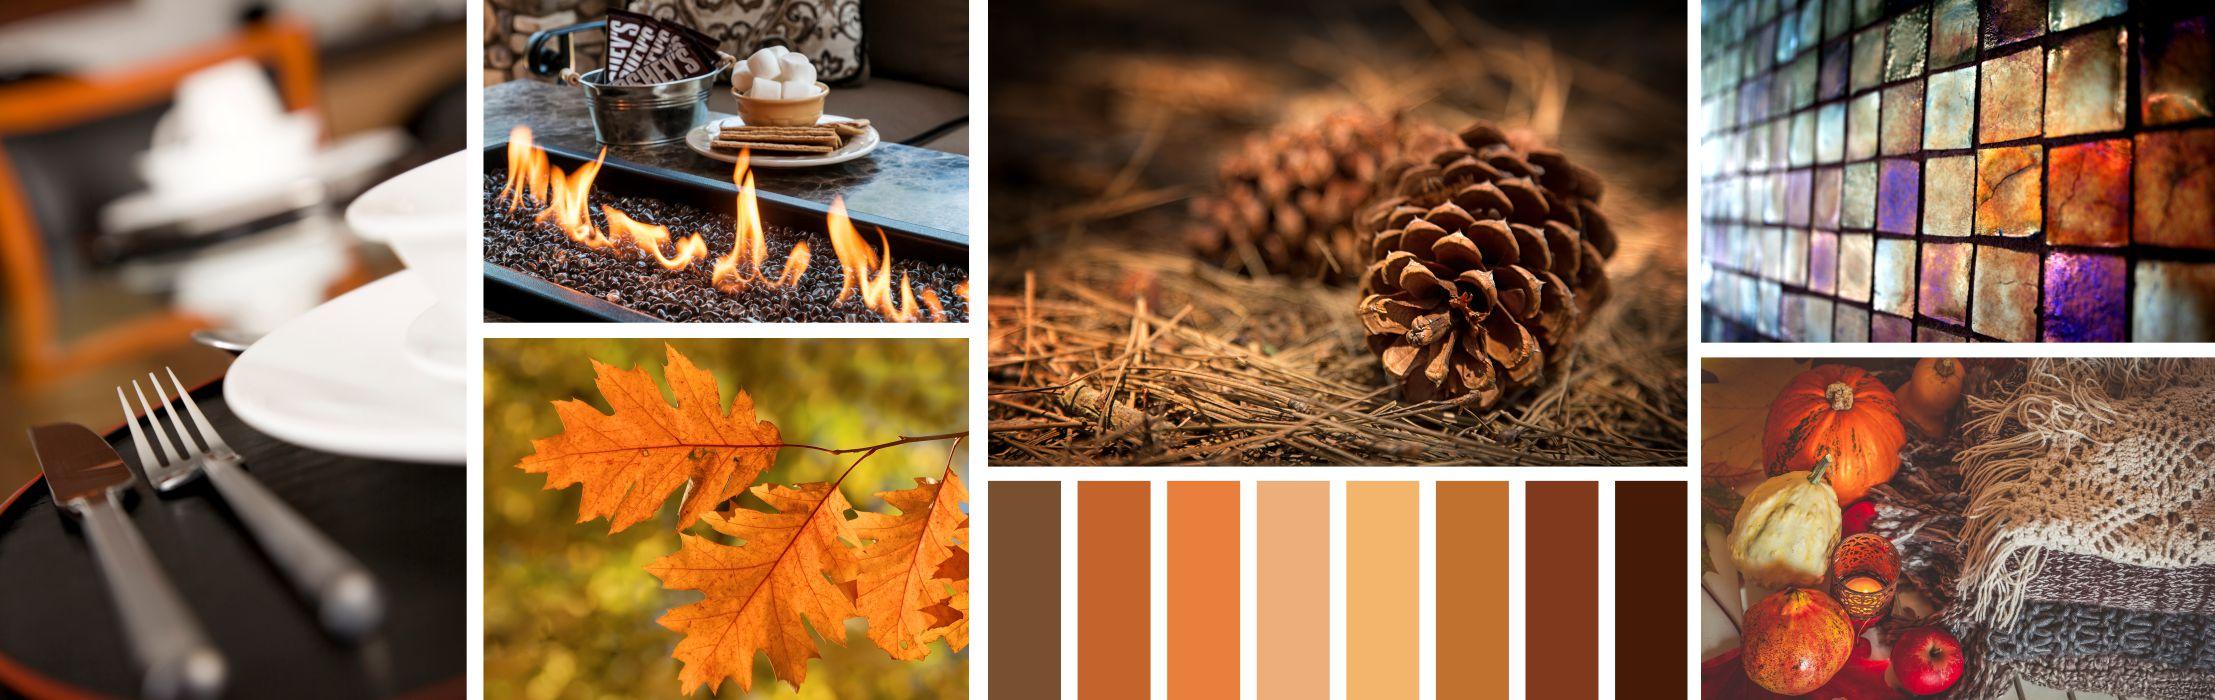 several thanksgiving and fall photos